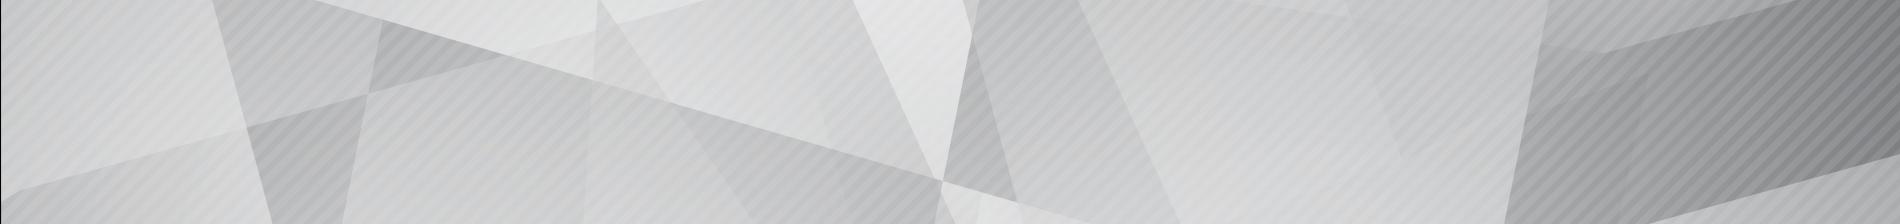 1ª ETAPA FORD MODELS VILLA LOBOS RUN SERIES - Imagem de topo